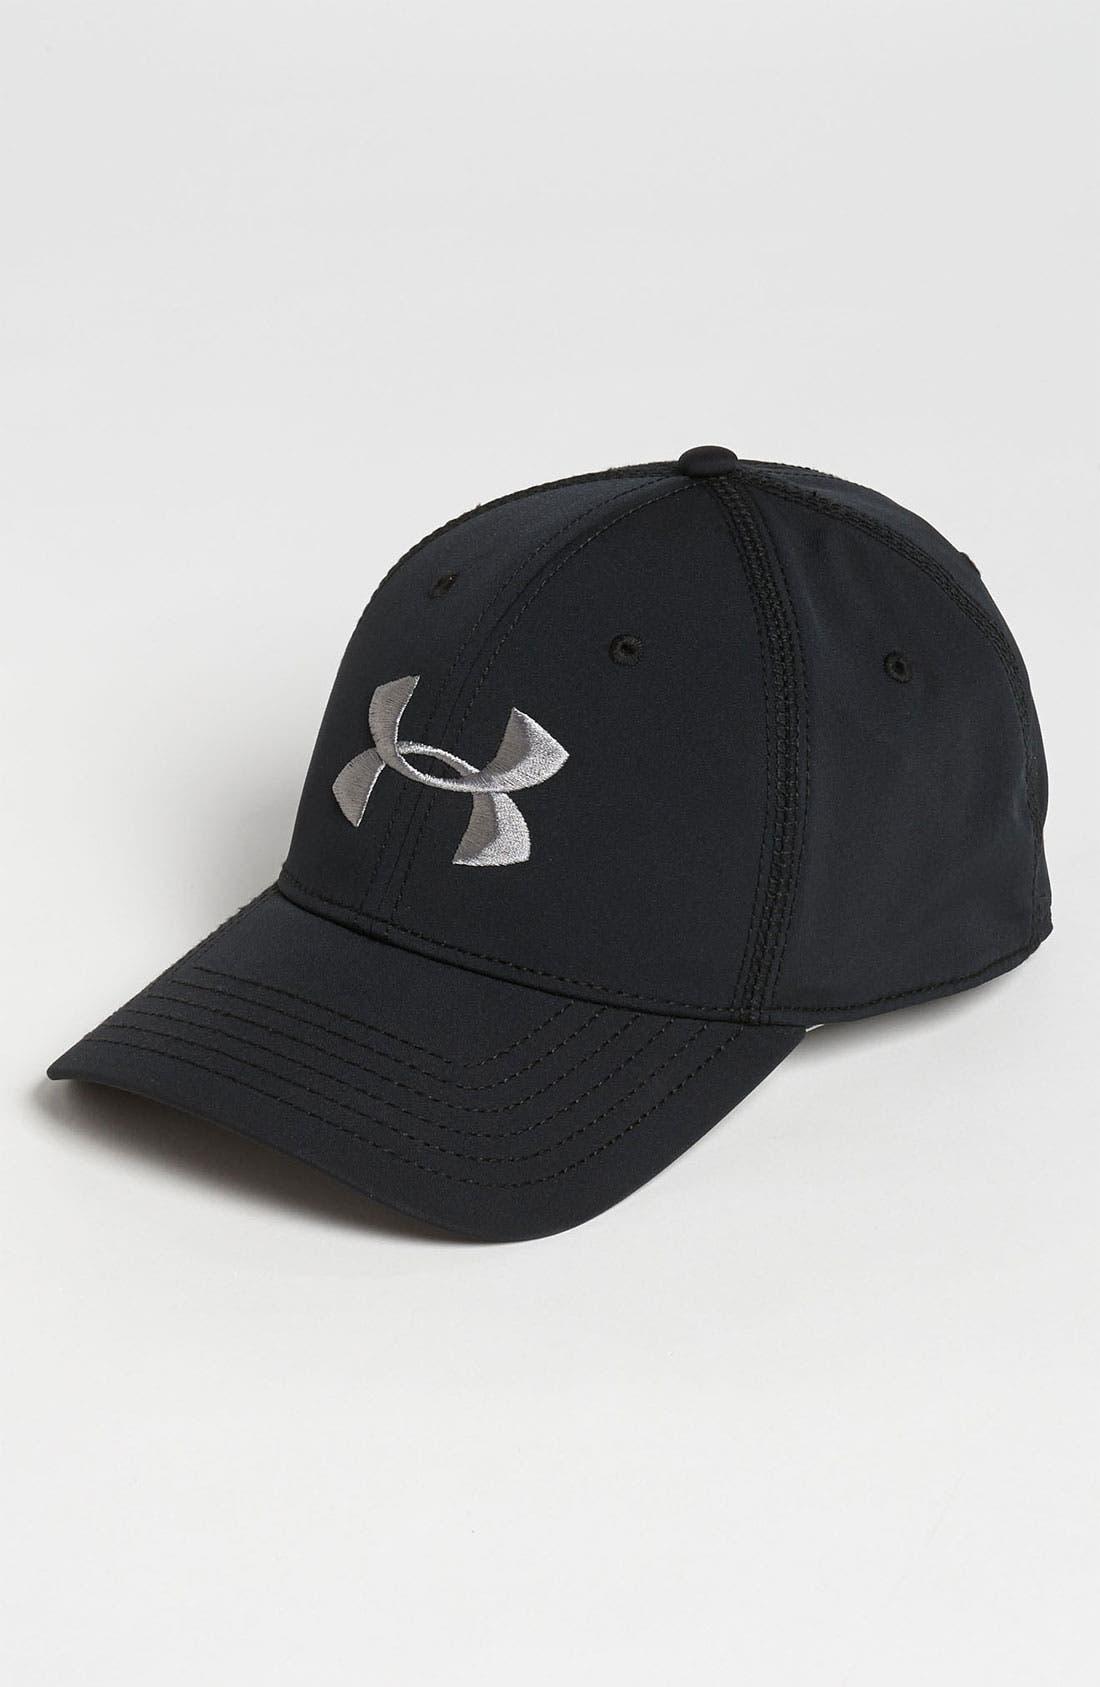 Alternate Image 1 Selected - Under Armour 'Huddle' Baseball Cap